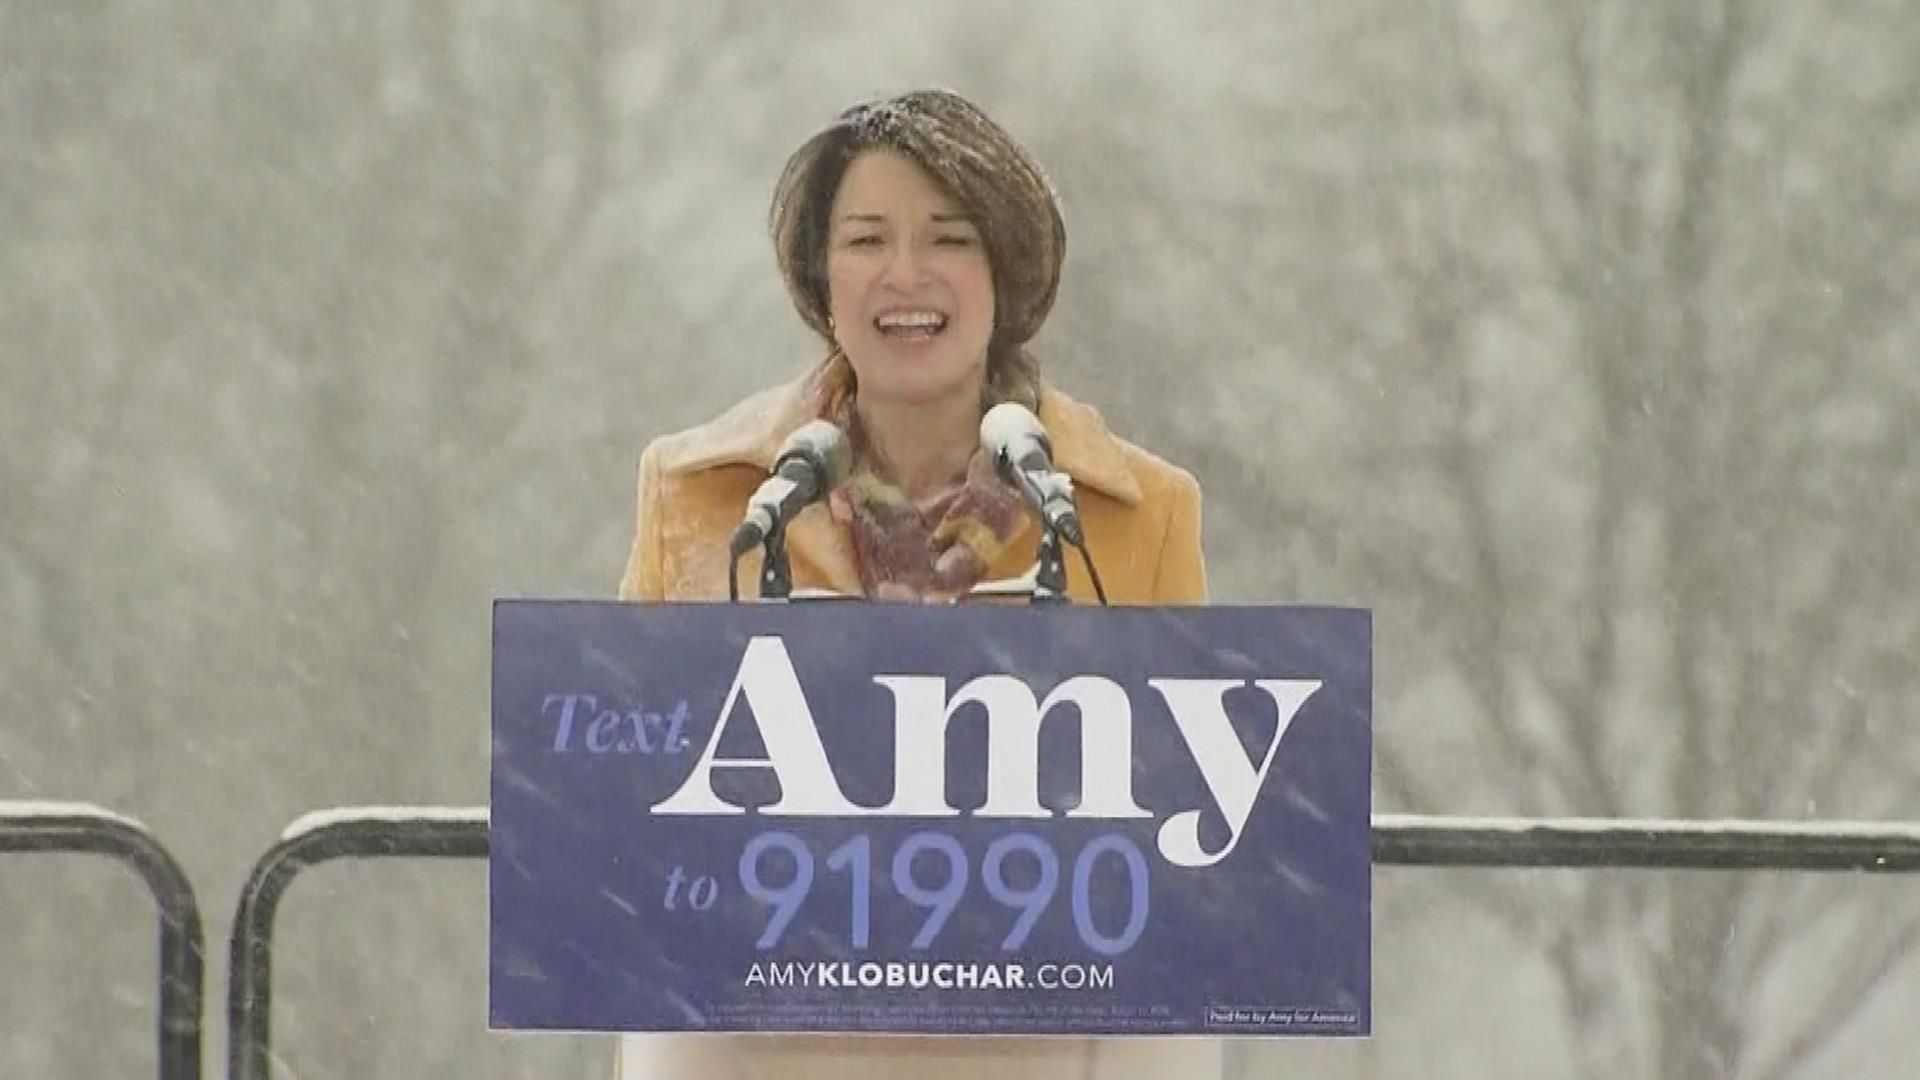 Democratic Sen. Amy Klobuchar announces run for president